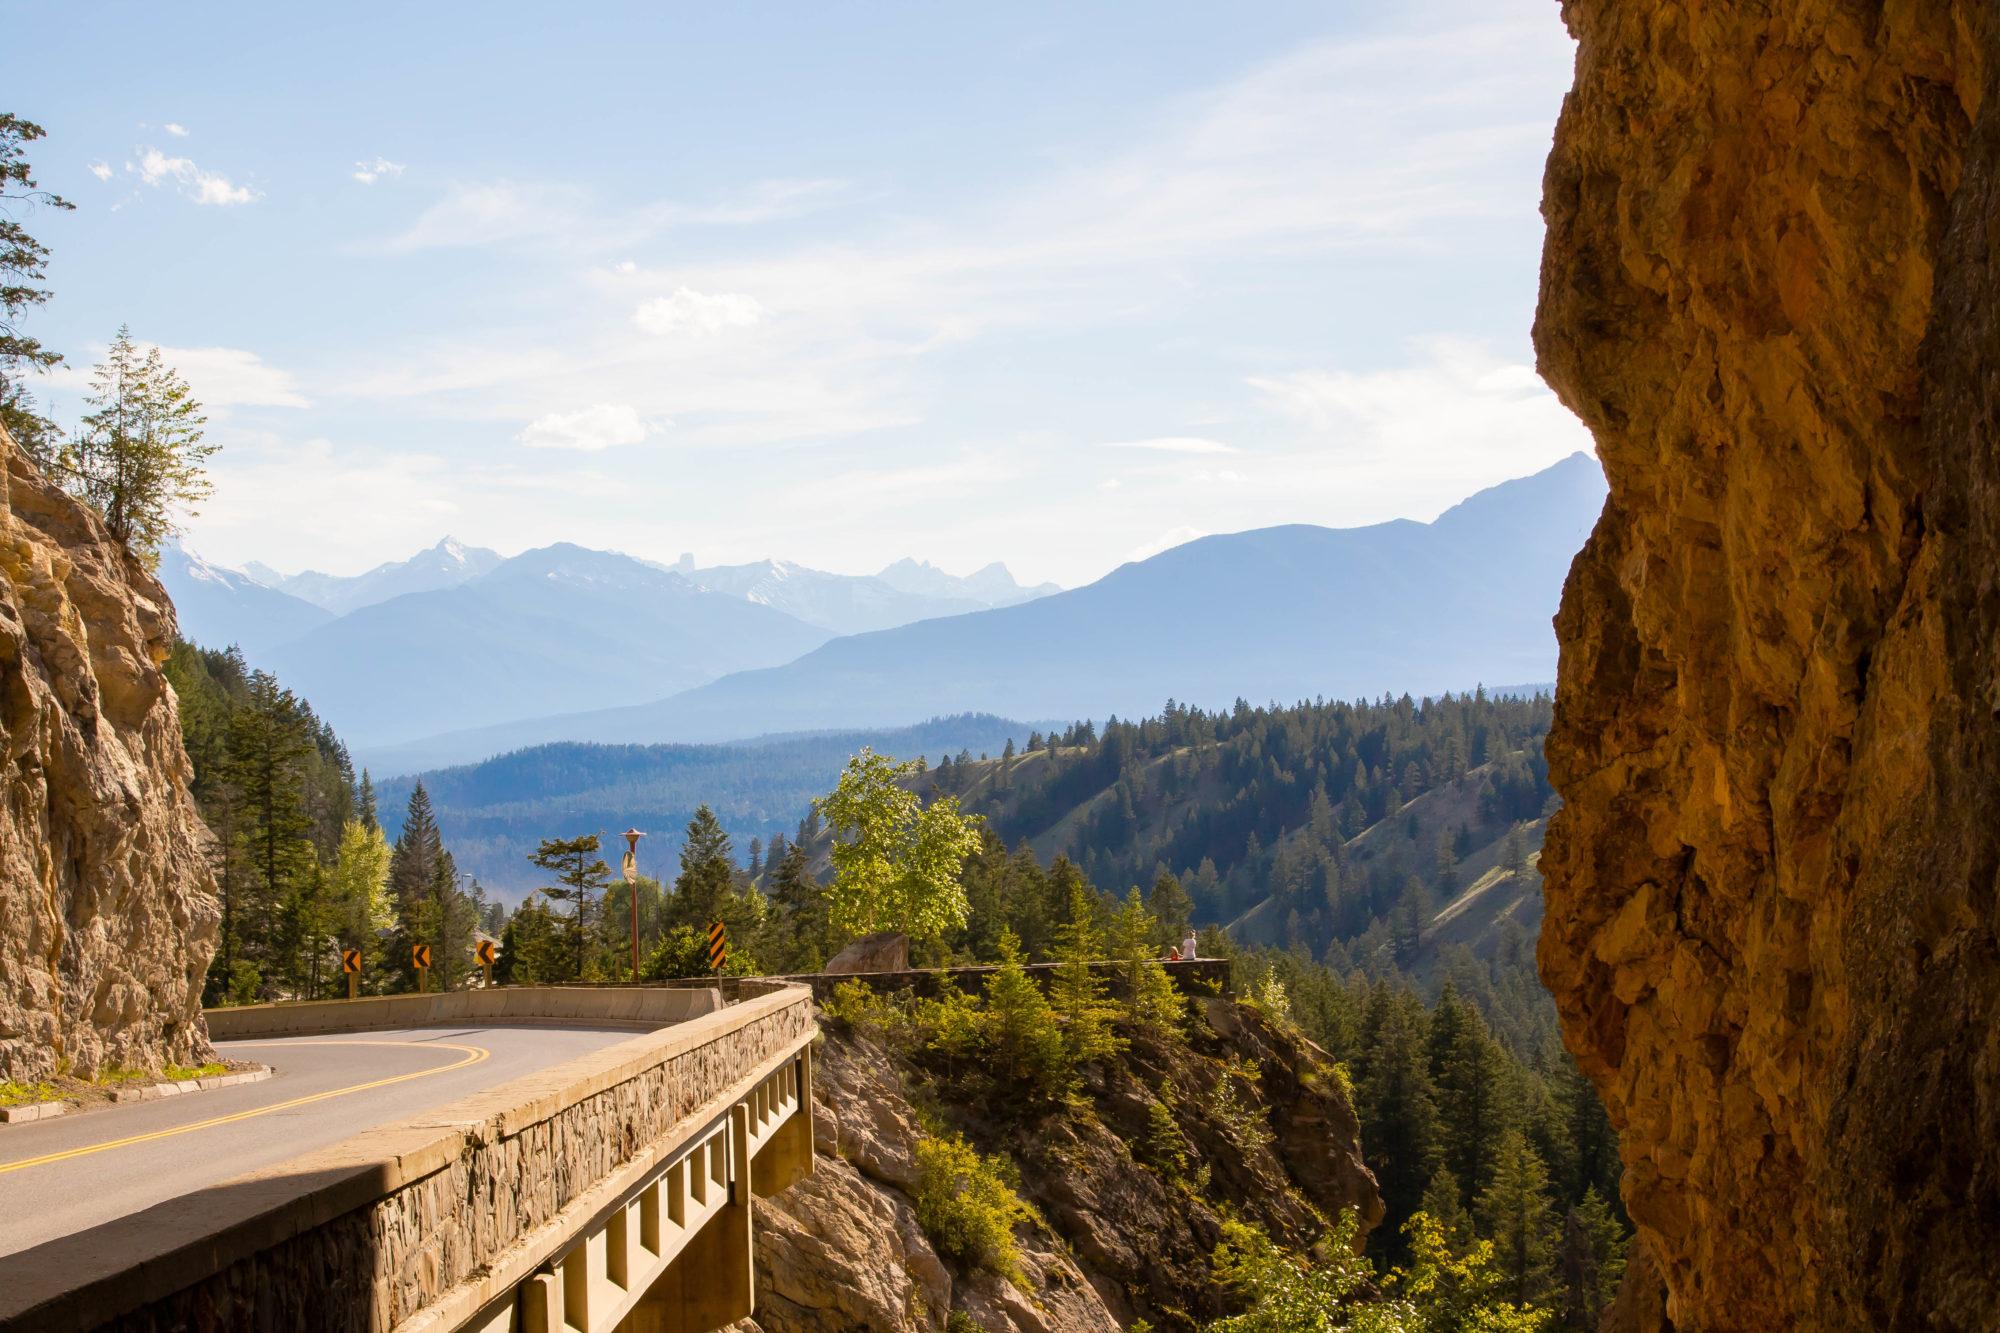 Kootenay Rockies Hot Springs, British Columbia